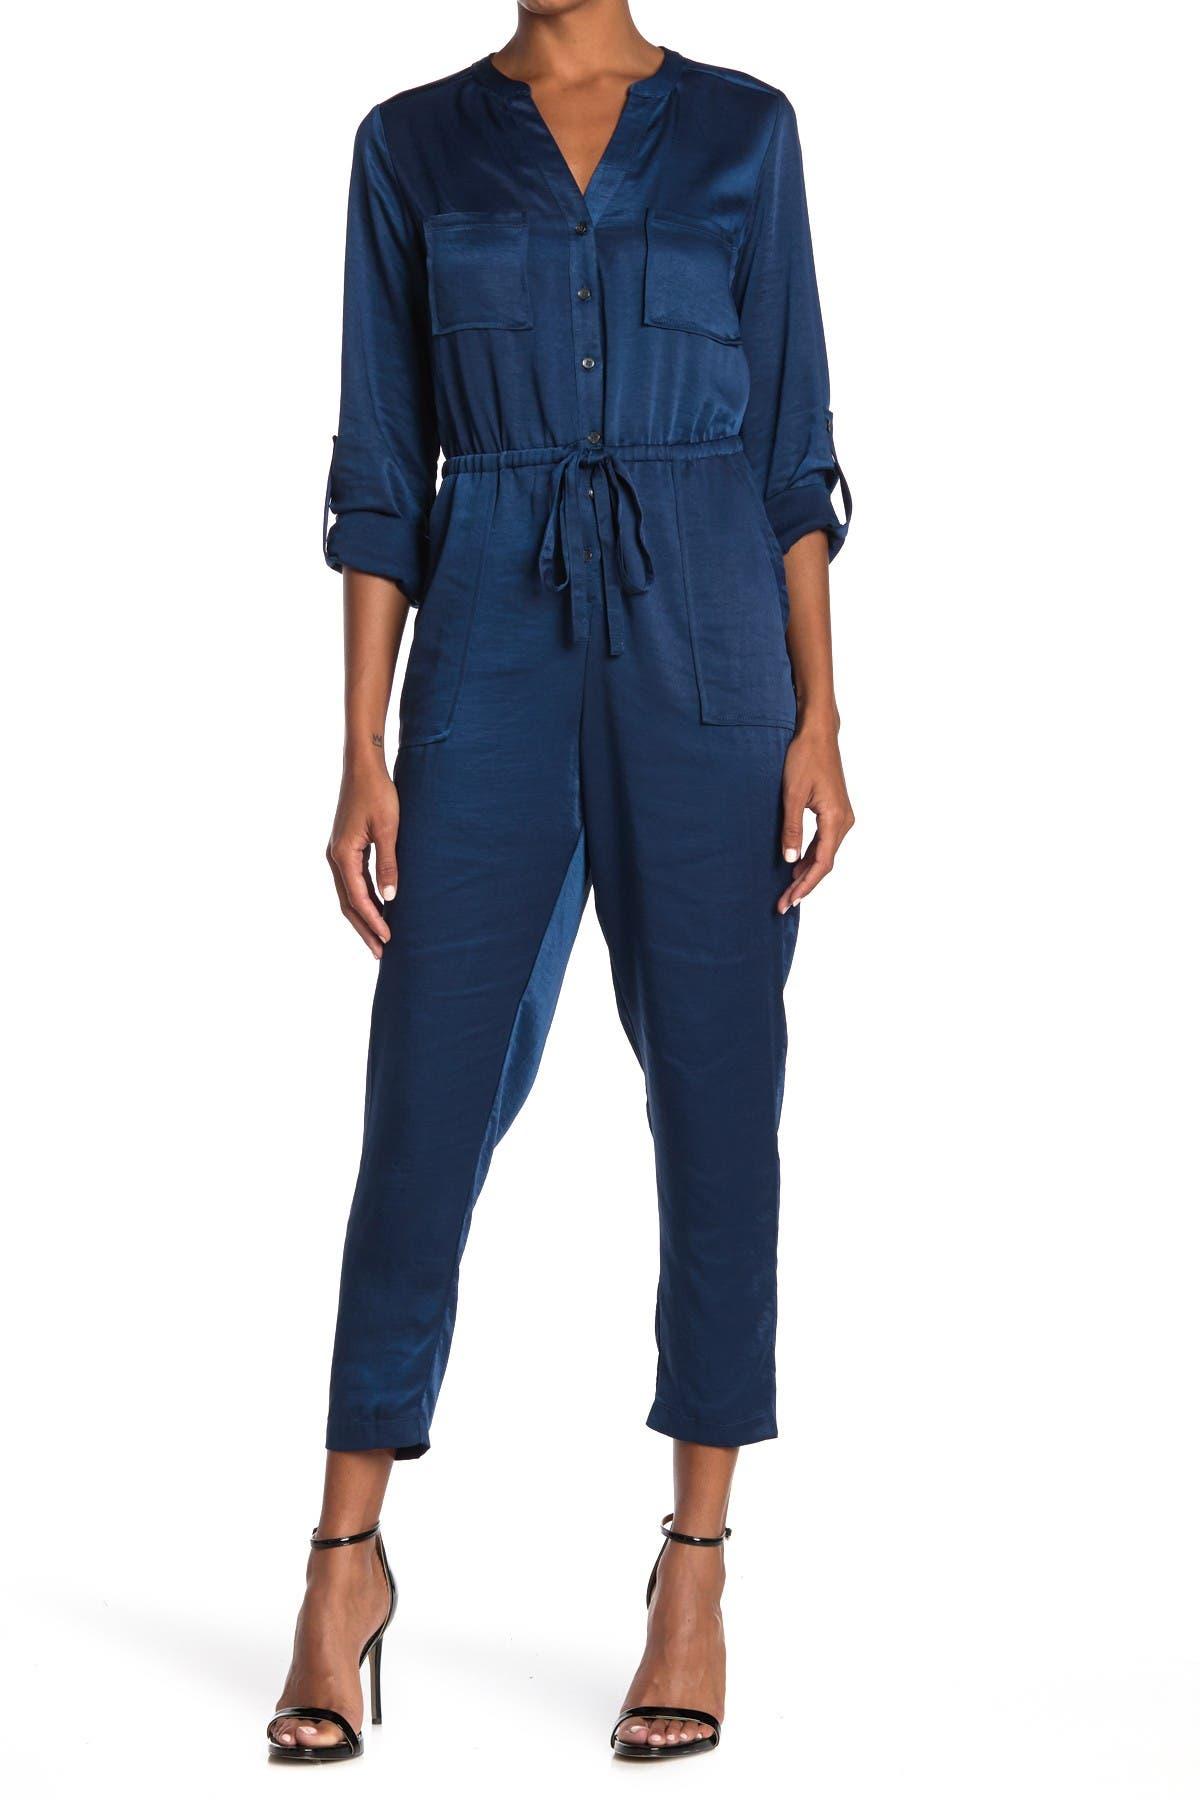 Image of Adelyn Rae Satin Utility Pocket Roll Sleeve Crop Jumpsuit